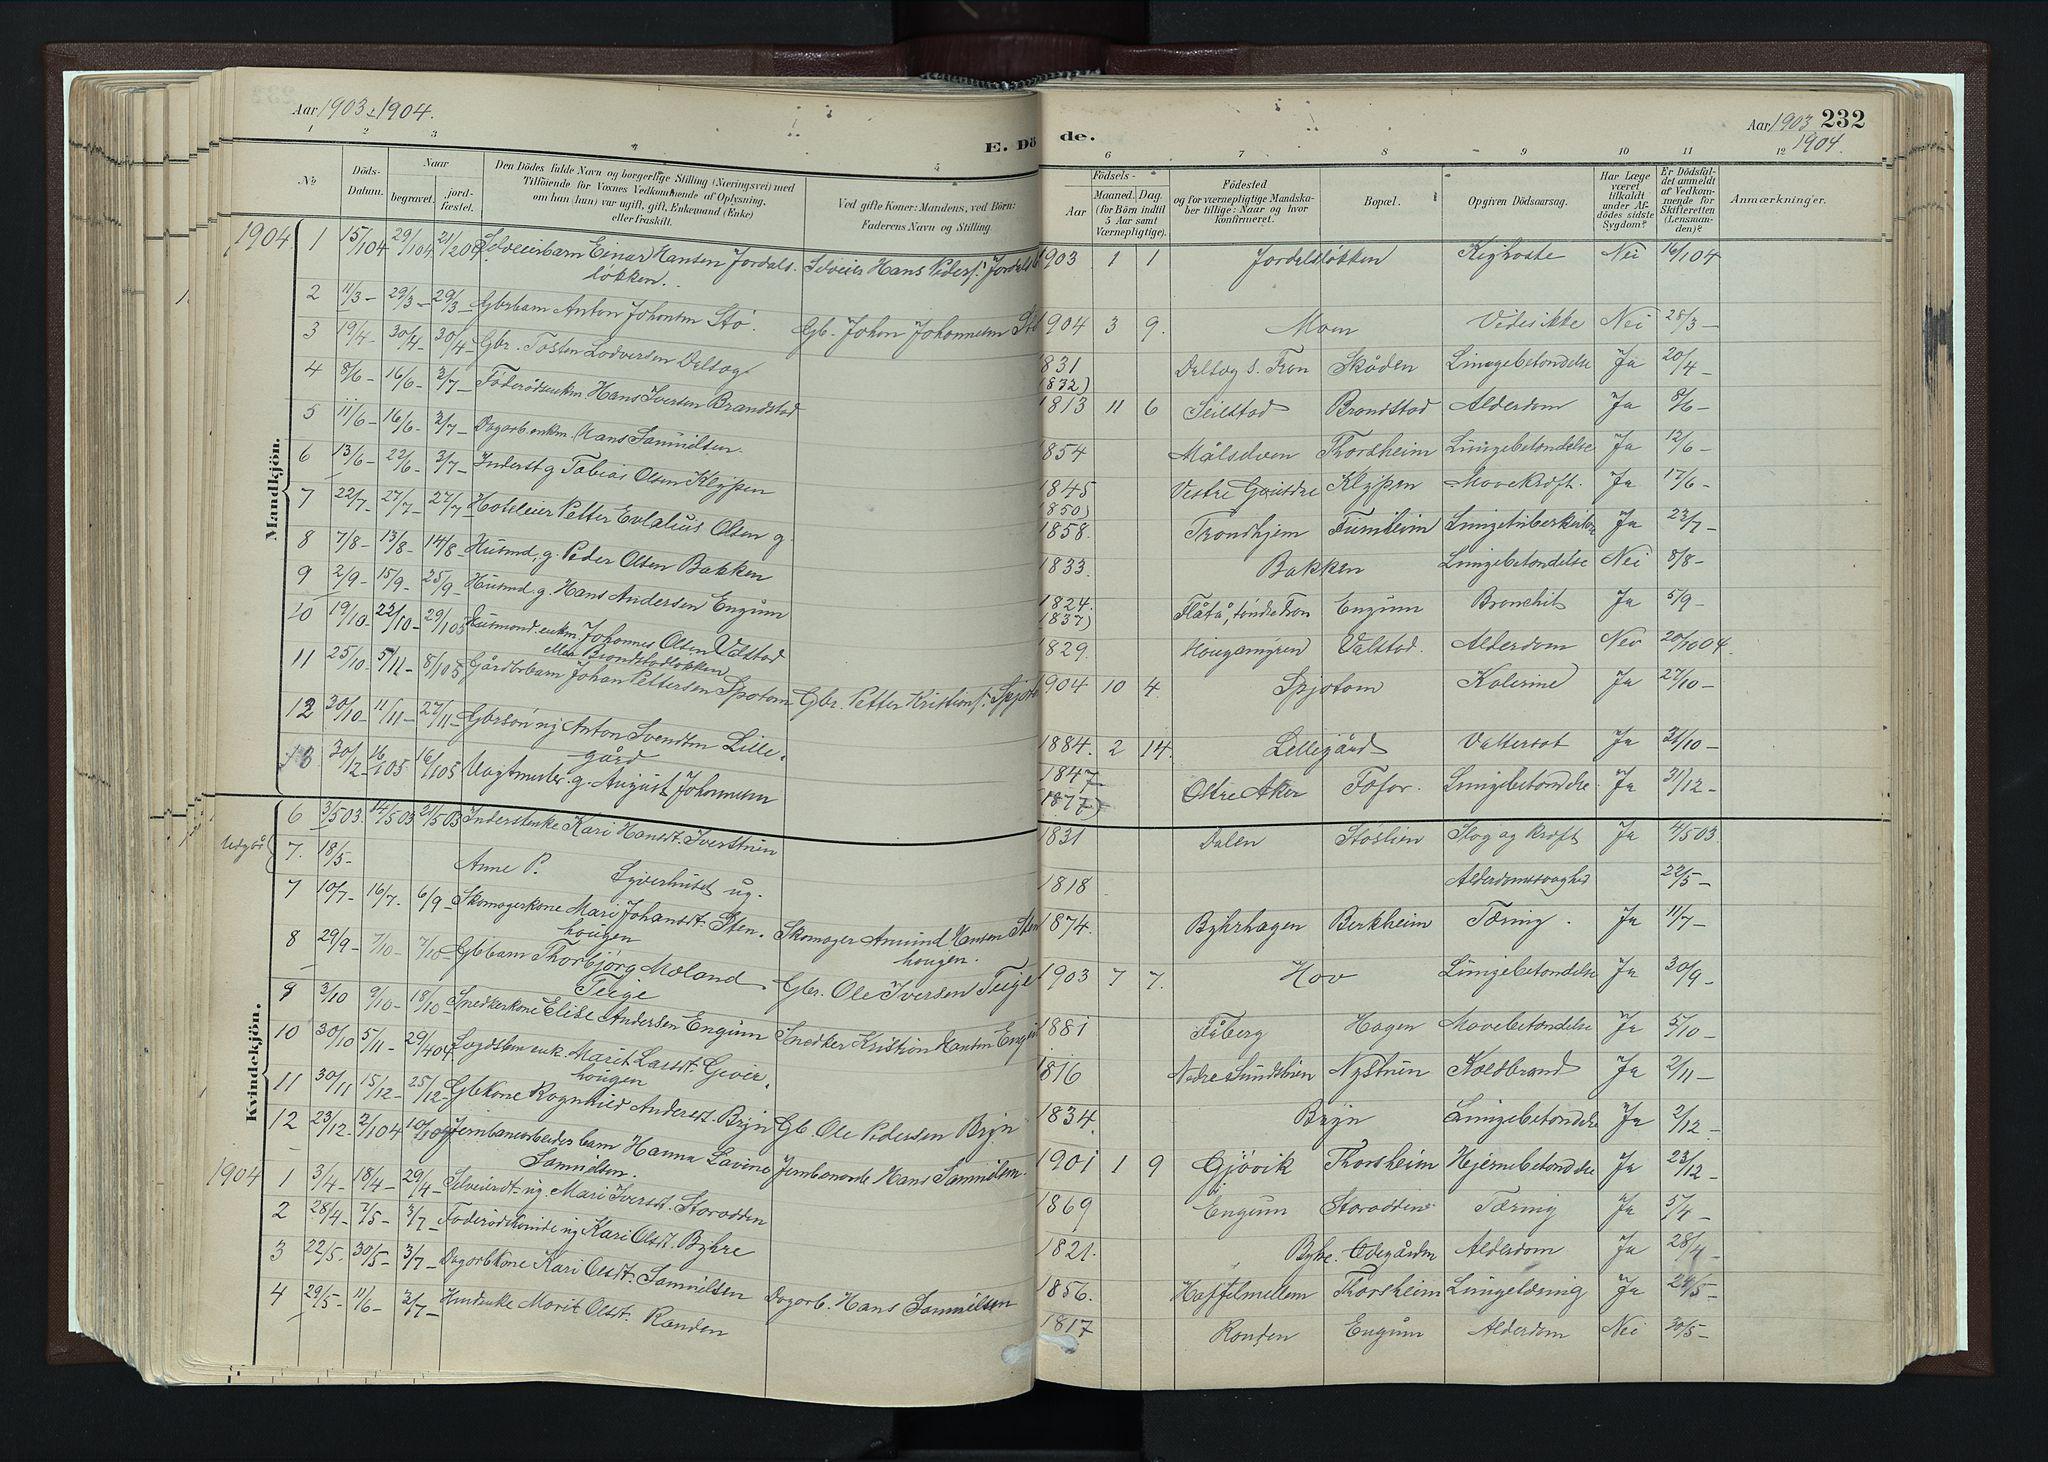 SAH, Nord-Fron prestekontor, Ministerialbok nr. 4, 1884-1914, s. 232